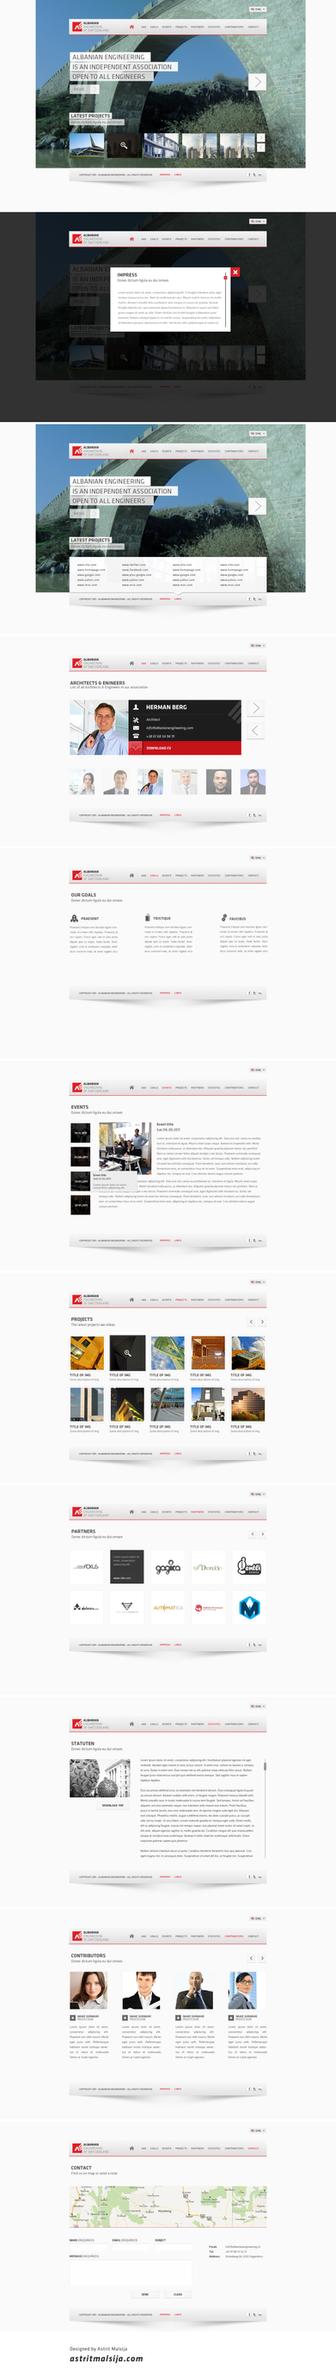 Albanian Engineering Web Design by blottah